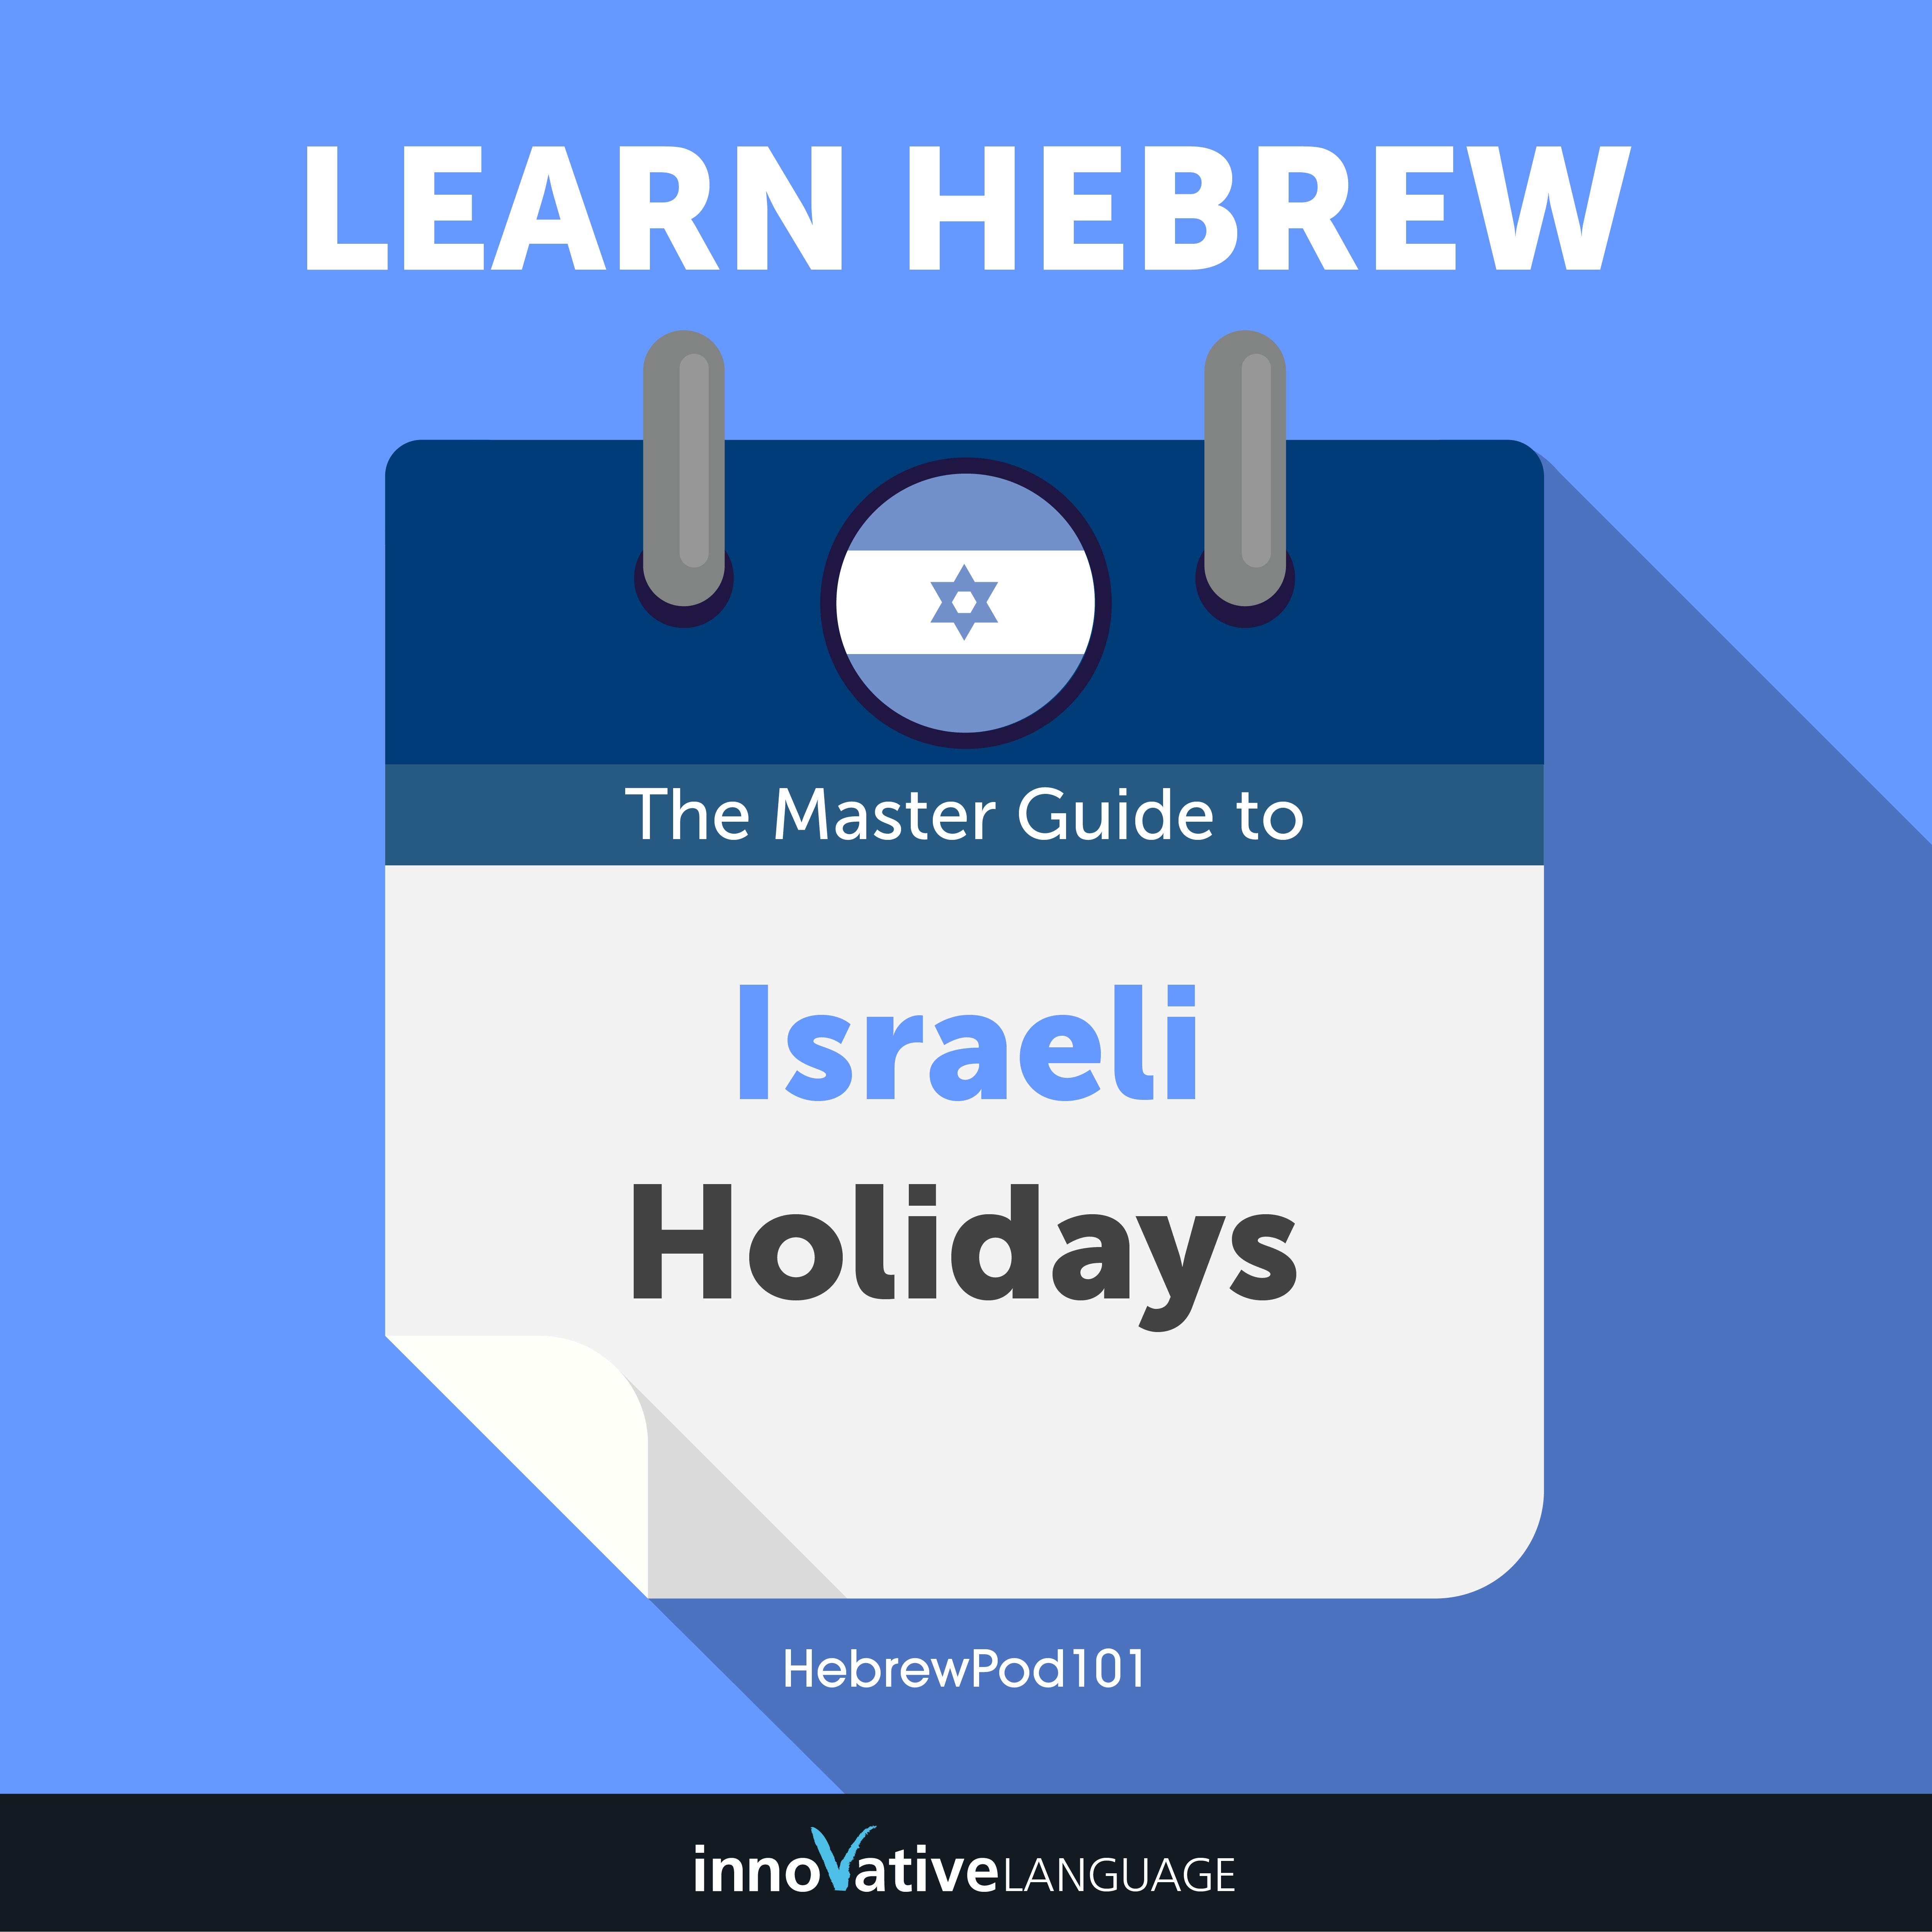 Amazon.com: learn hebrew audio: Books